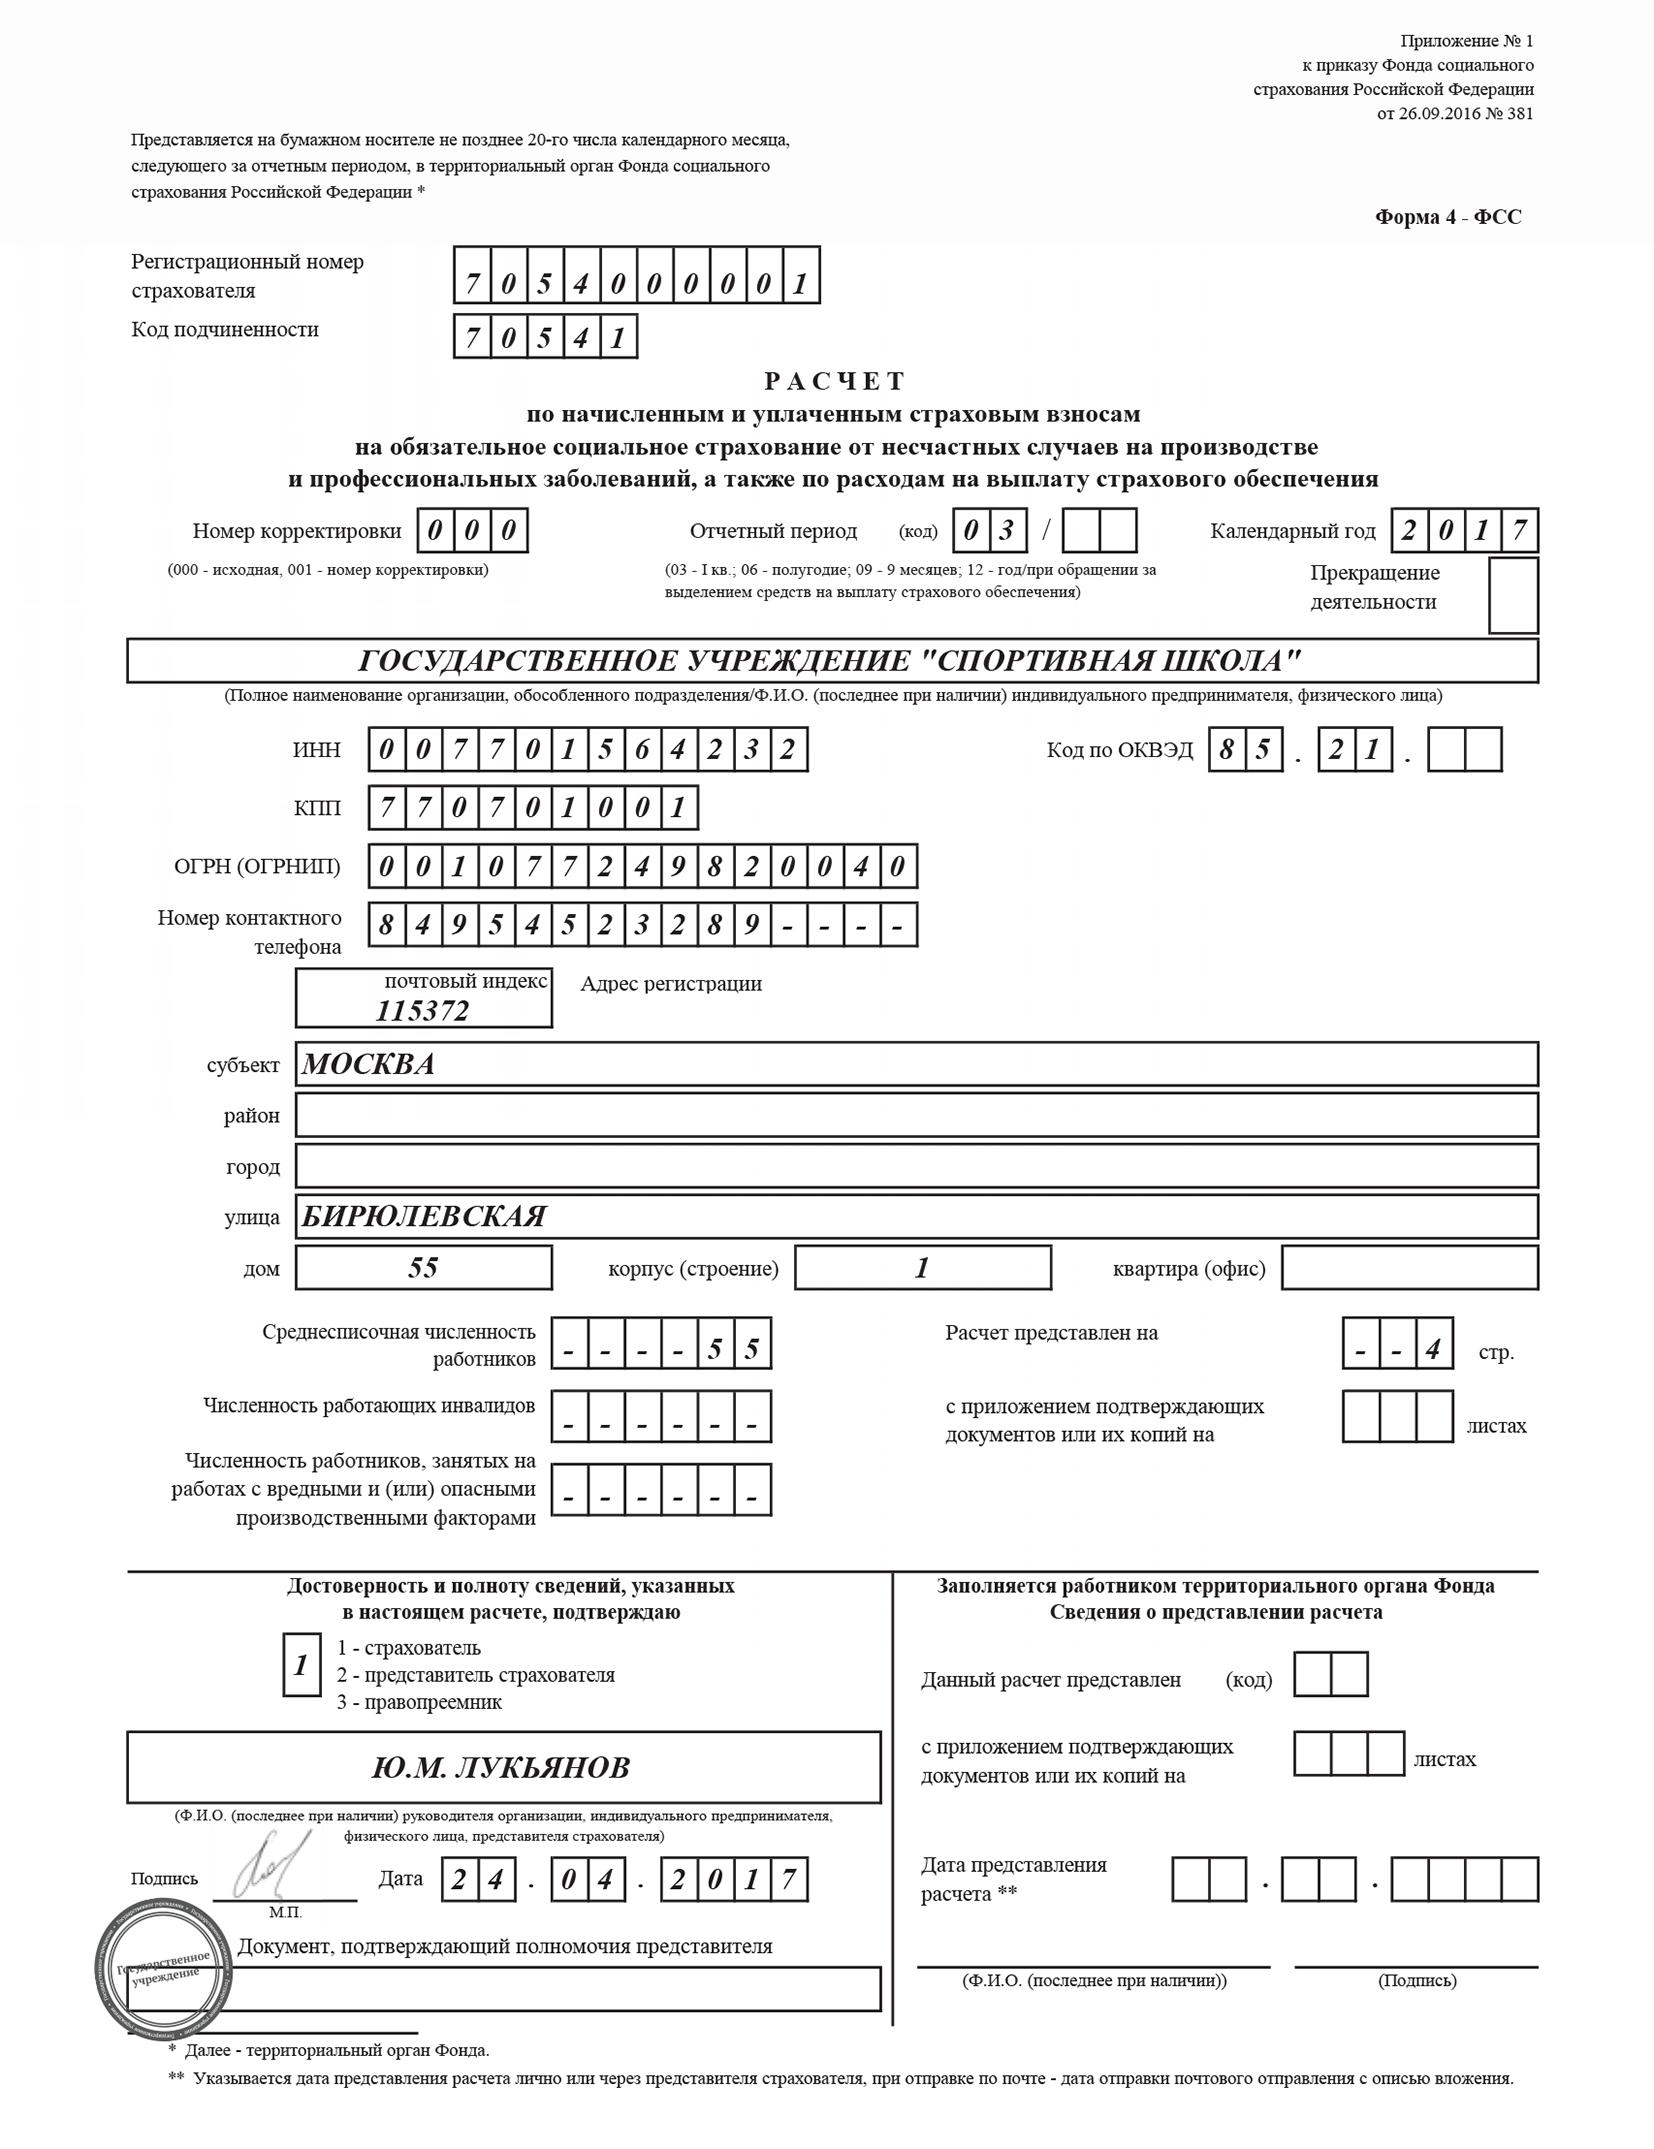 бланк фсс-4 за 1 квартал 2014 новая форма